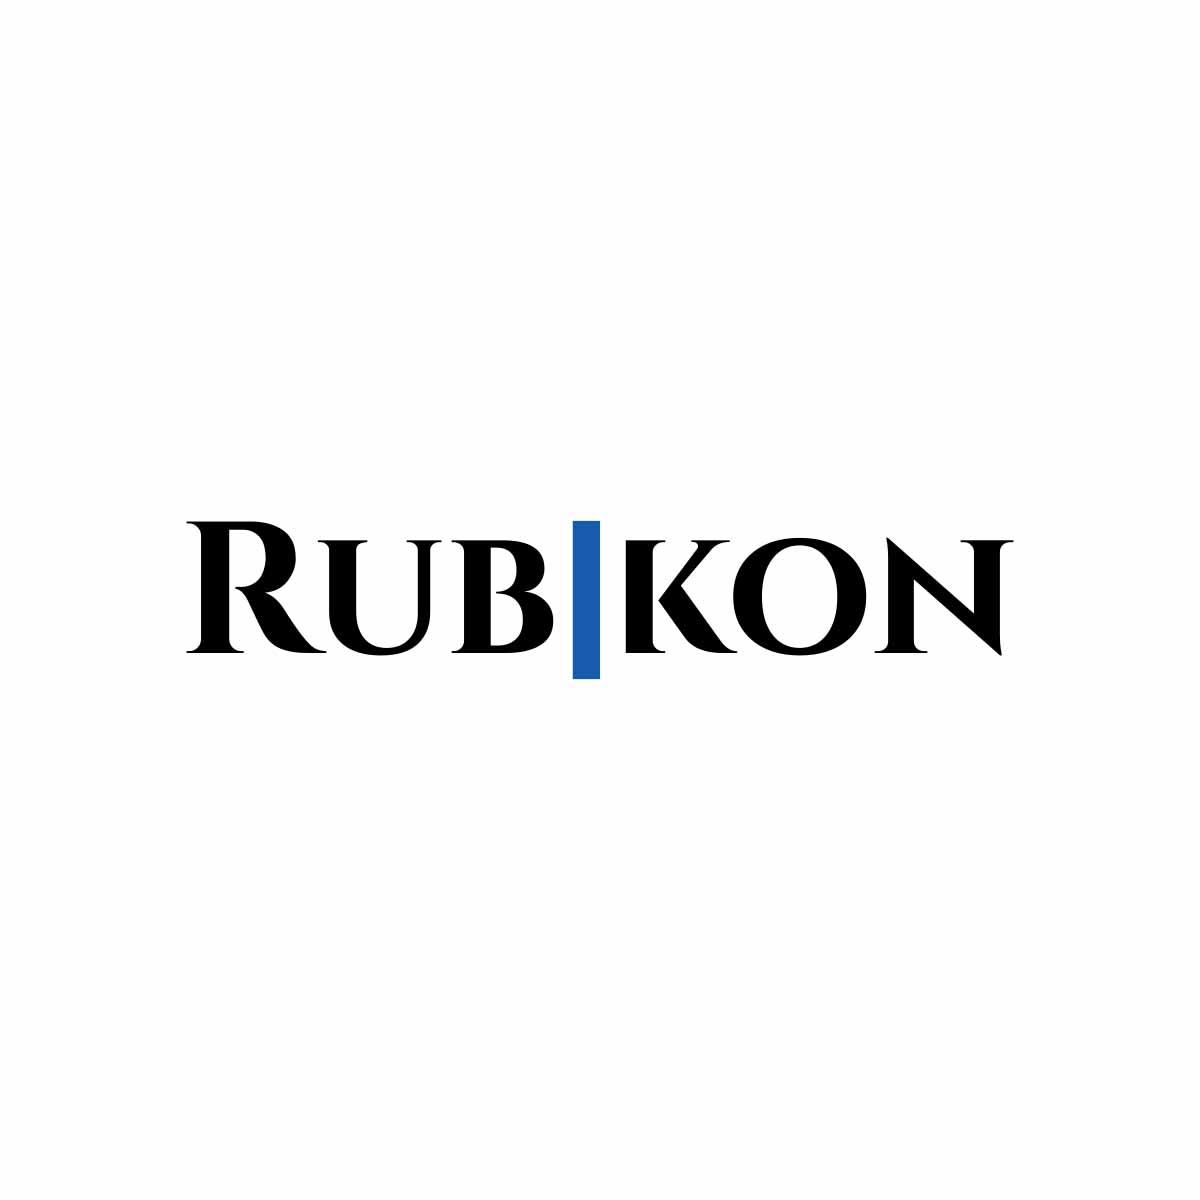 Rubikon.jpg